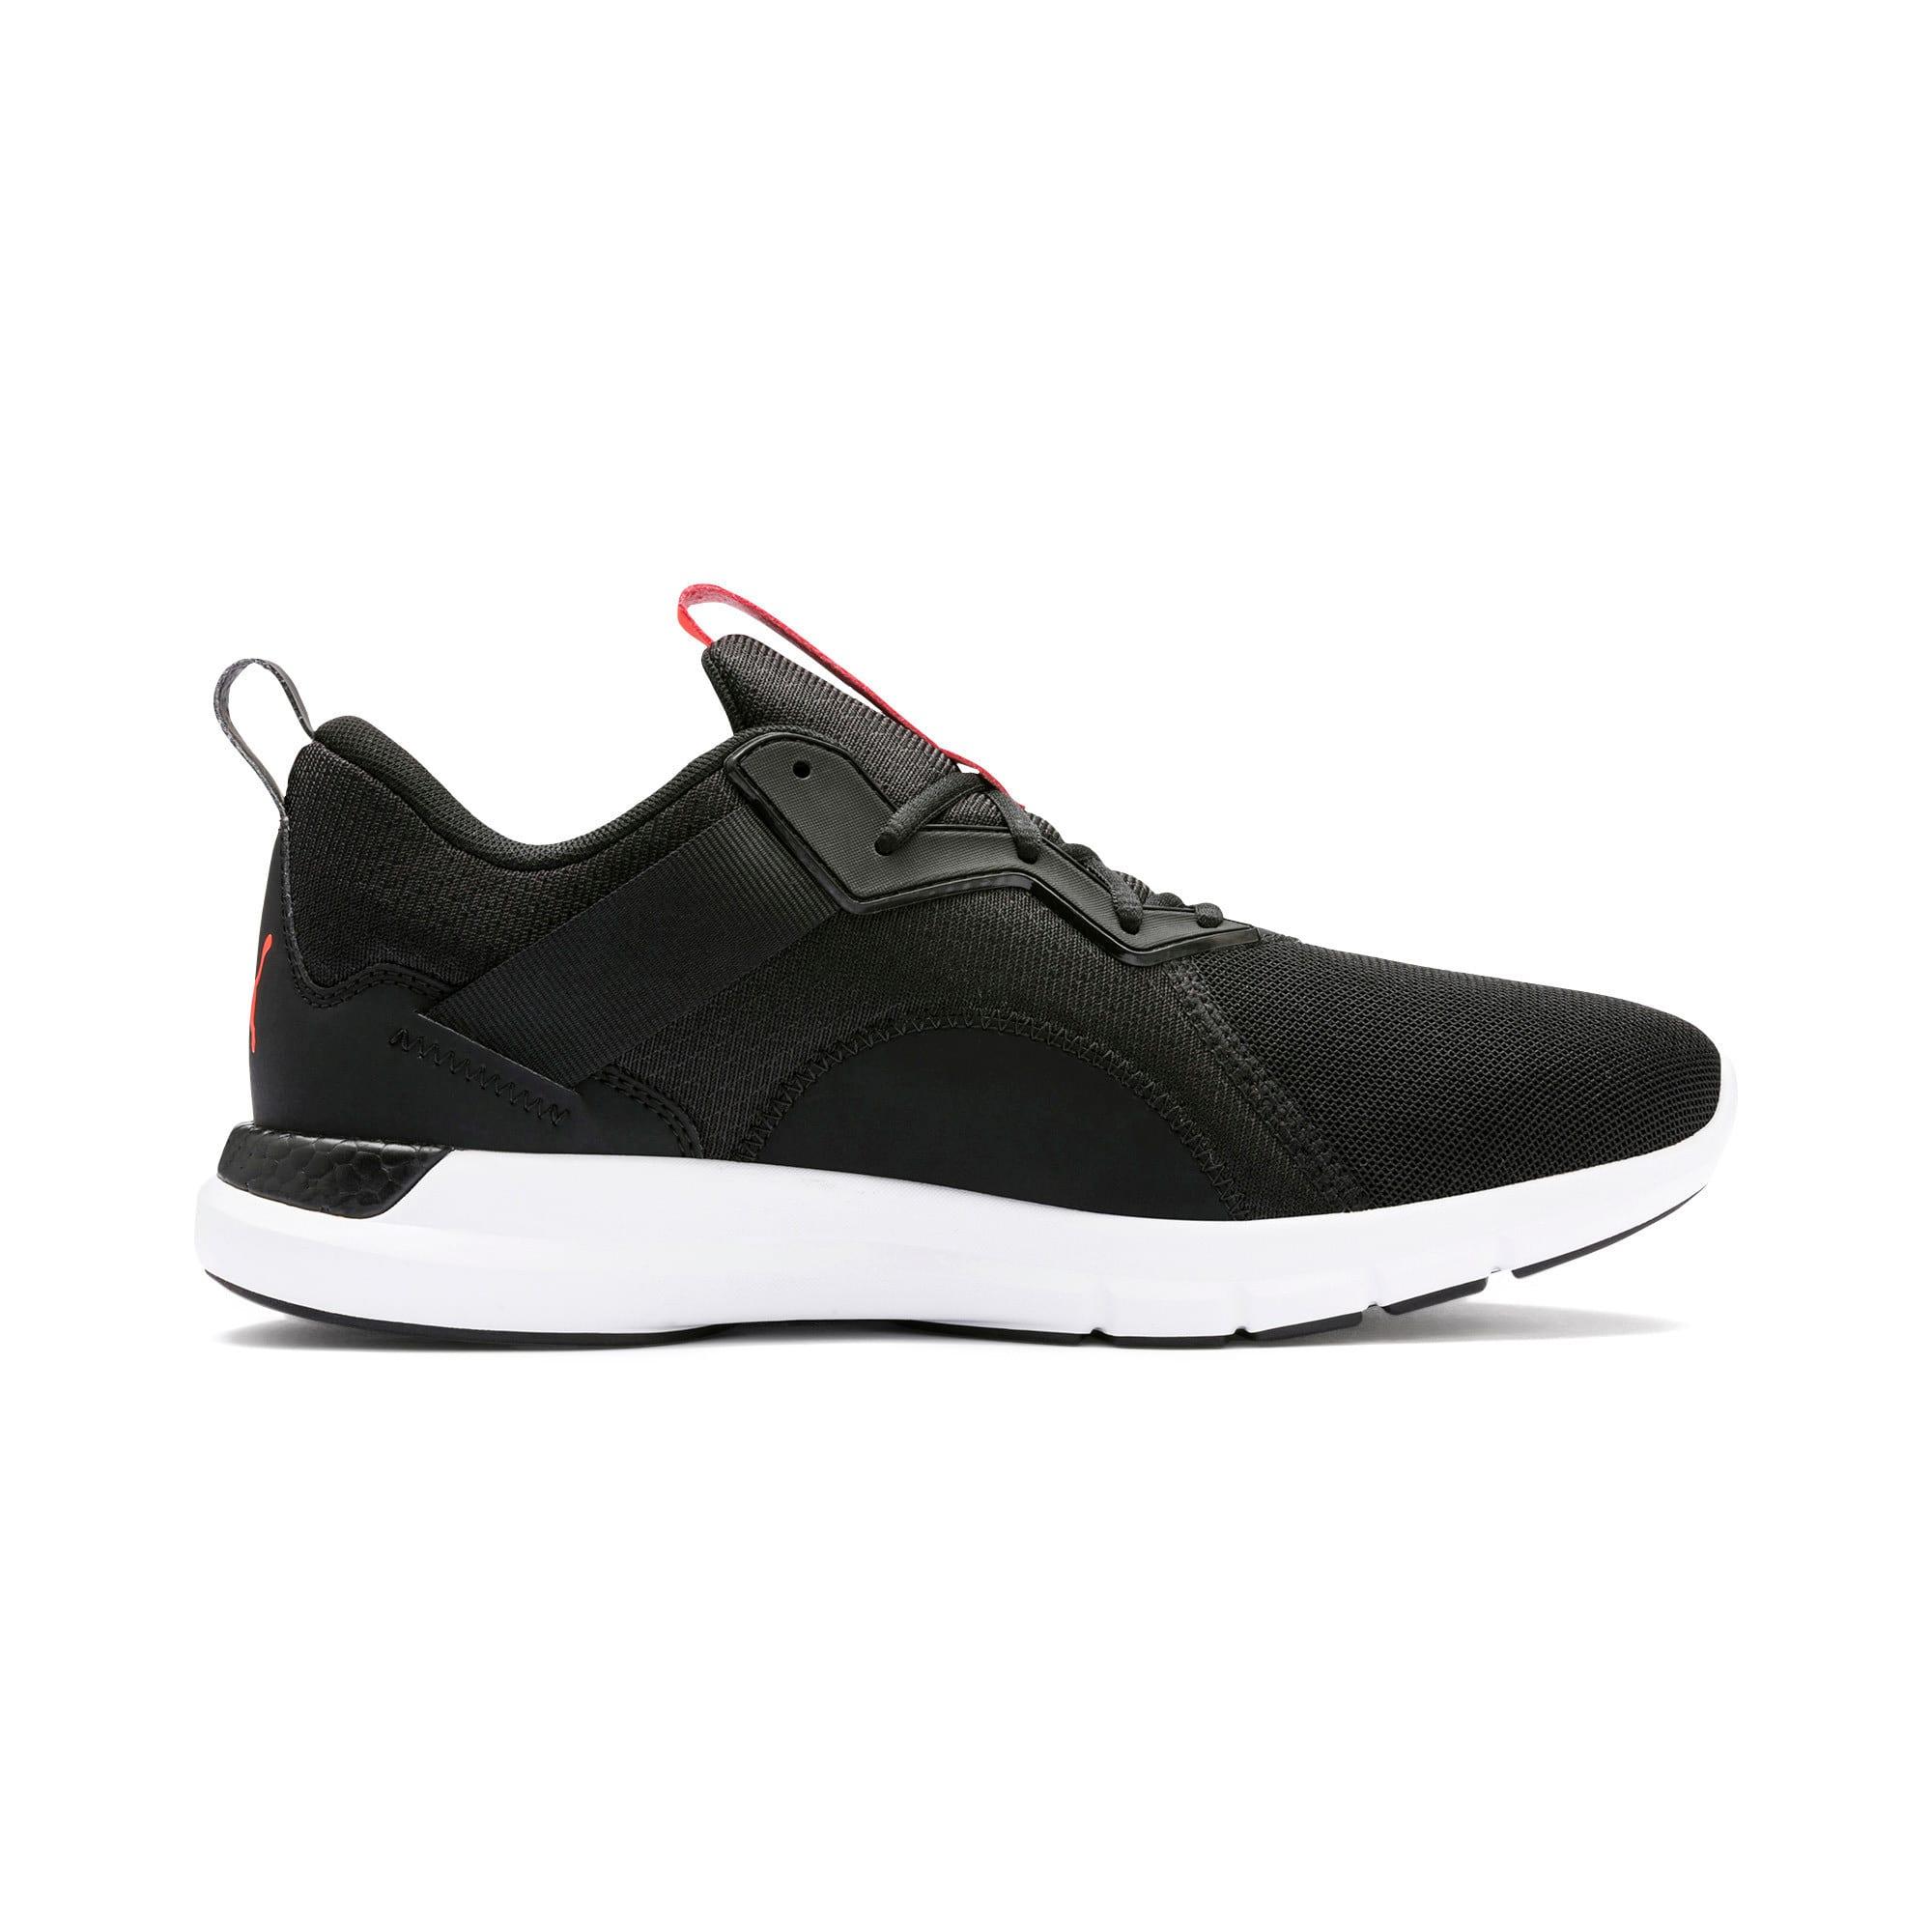 Thumbnail 6 of NRGY Dynamo Futuro Men's Running Shoes, Puma Black-Nrgy Red, medium